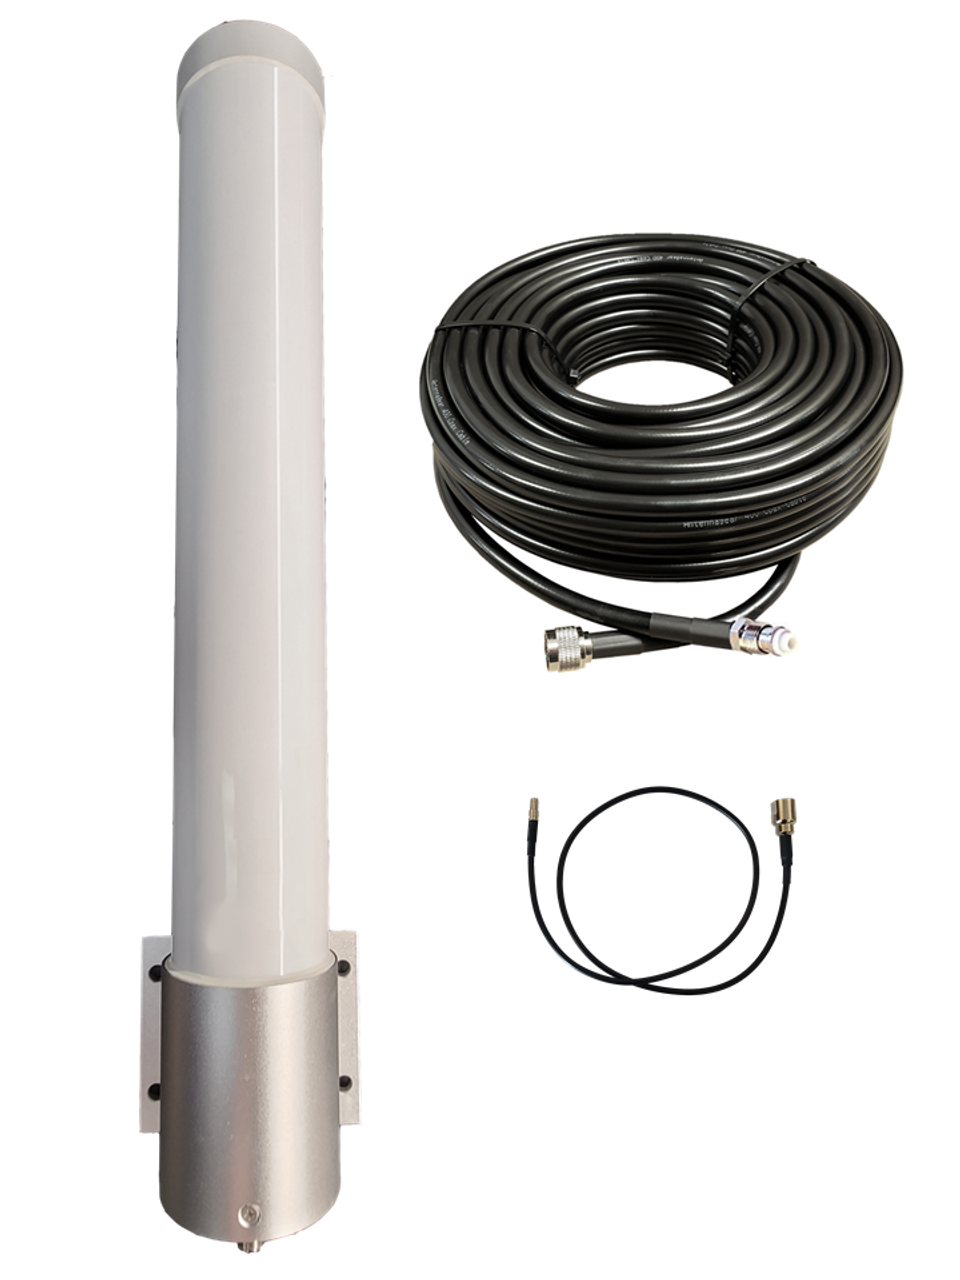 M25 Omni Directional 4G LTE CBRS 5G NR M2M IOT Antenna w/Coax Cable Kit Options for Verizon Novatel Jetpack MiFi 7730L